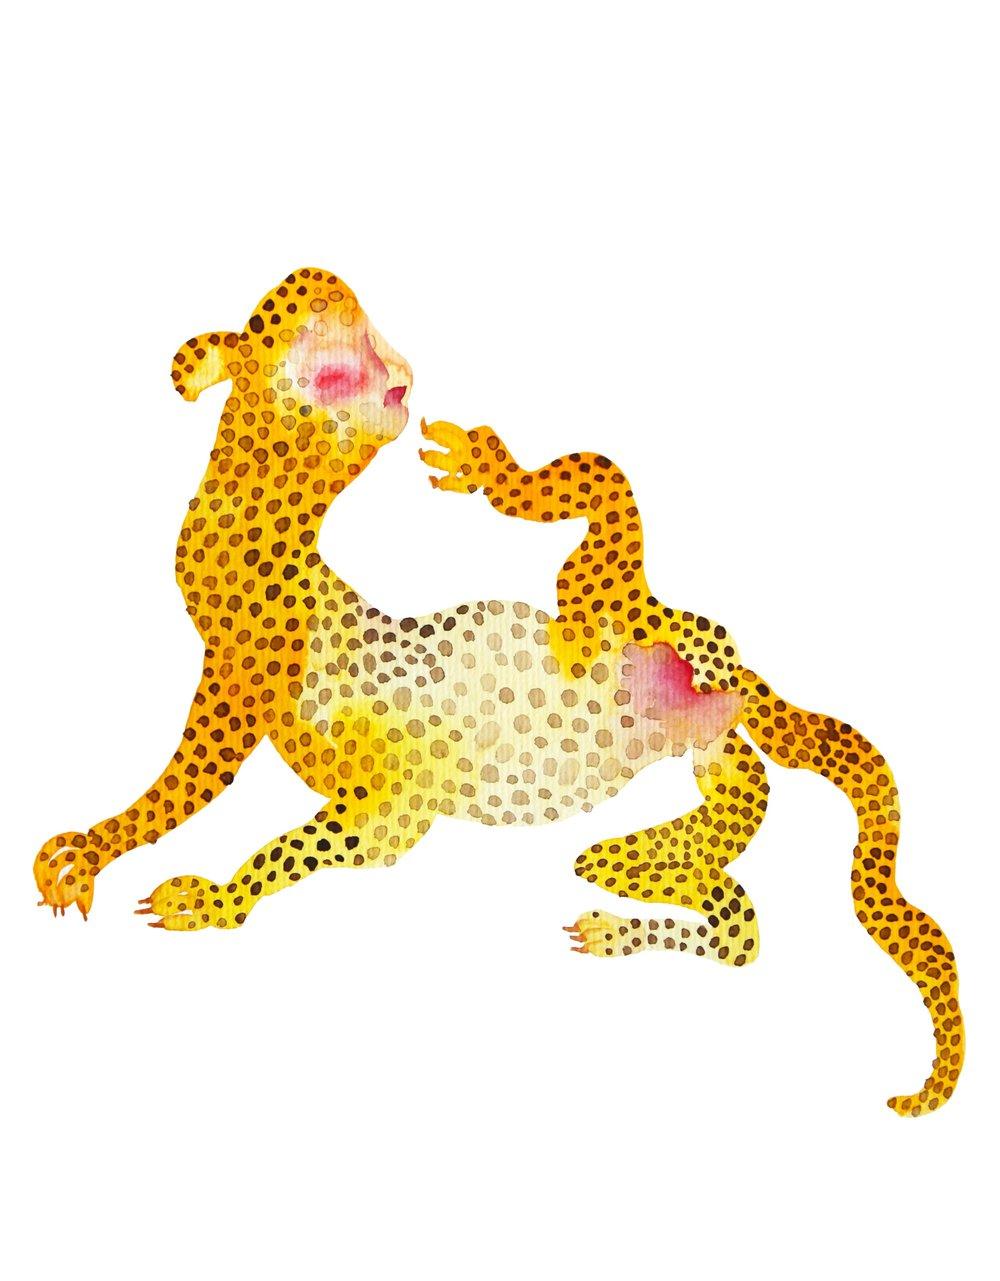 Leopard woman  , 2016, watercolor on paper,30x40cm